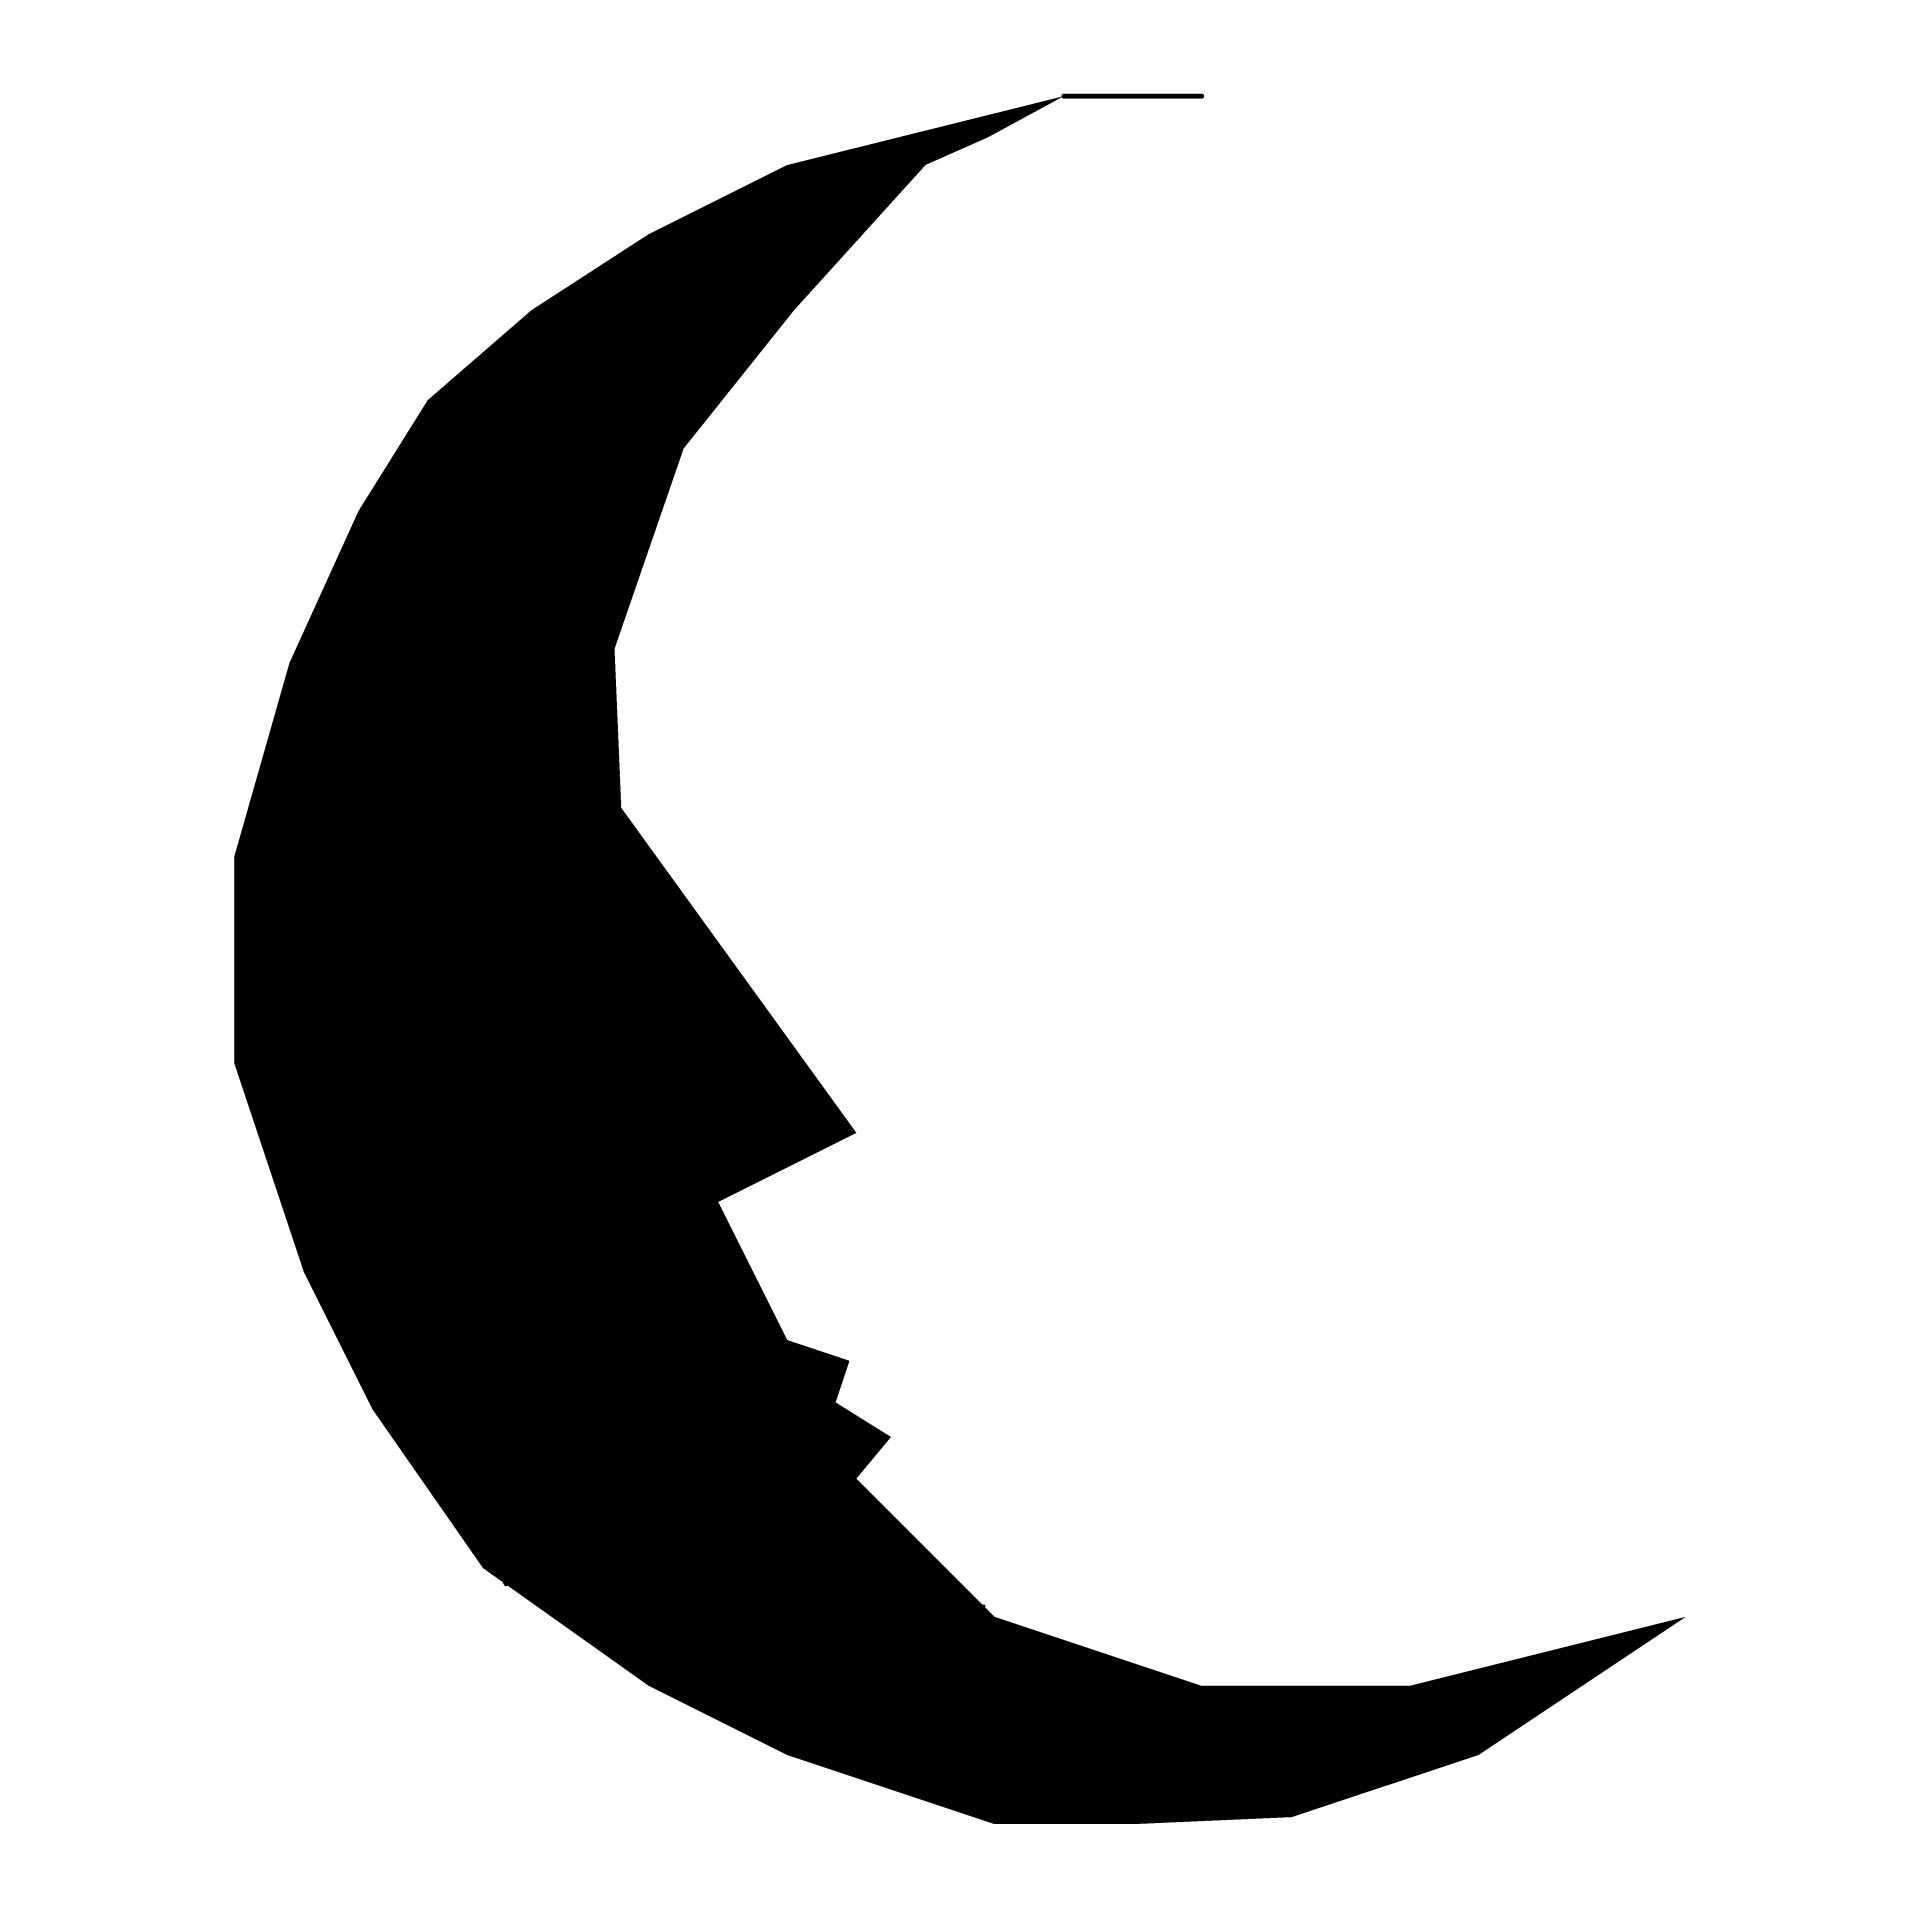 1920x1920 Silhouette Moon Free Stock Photo